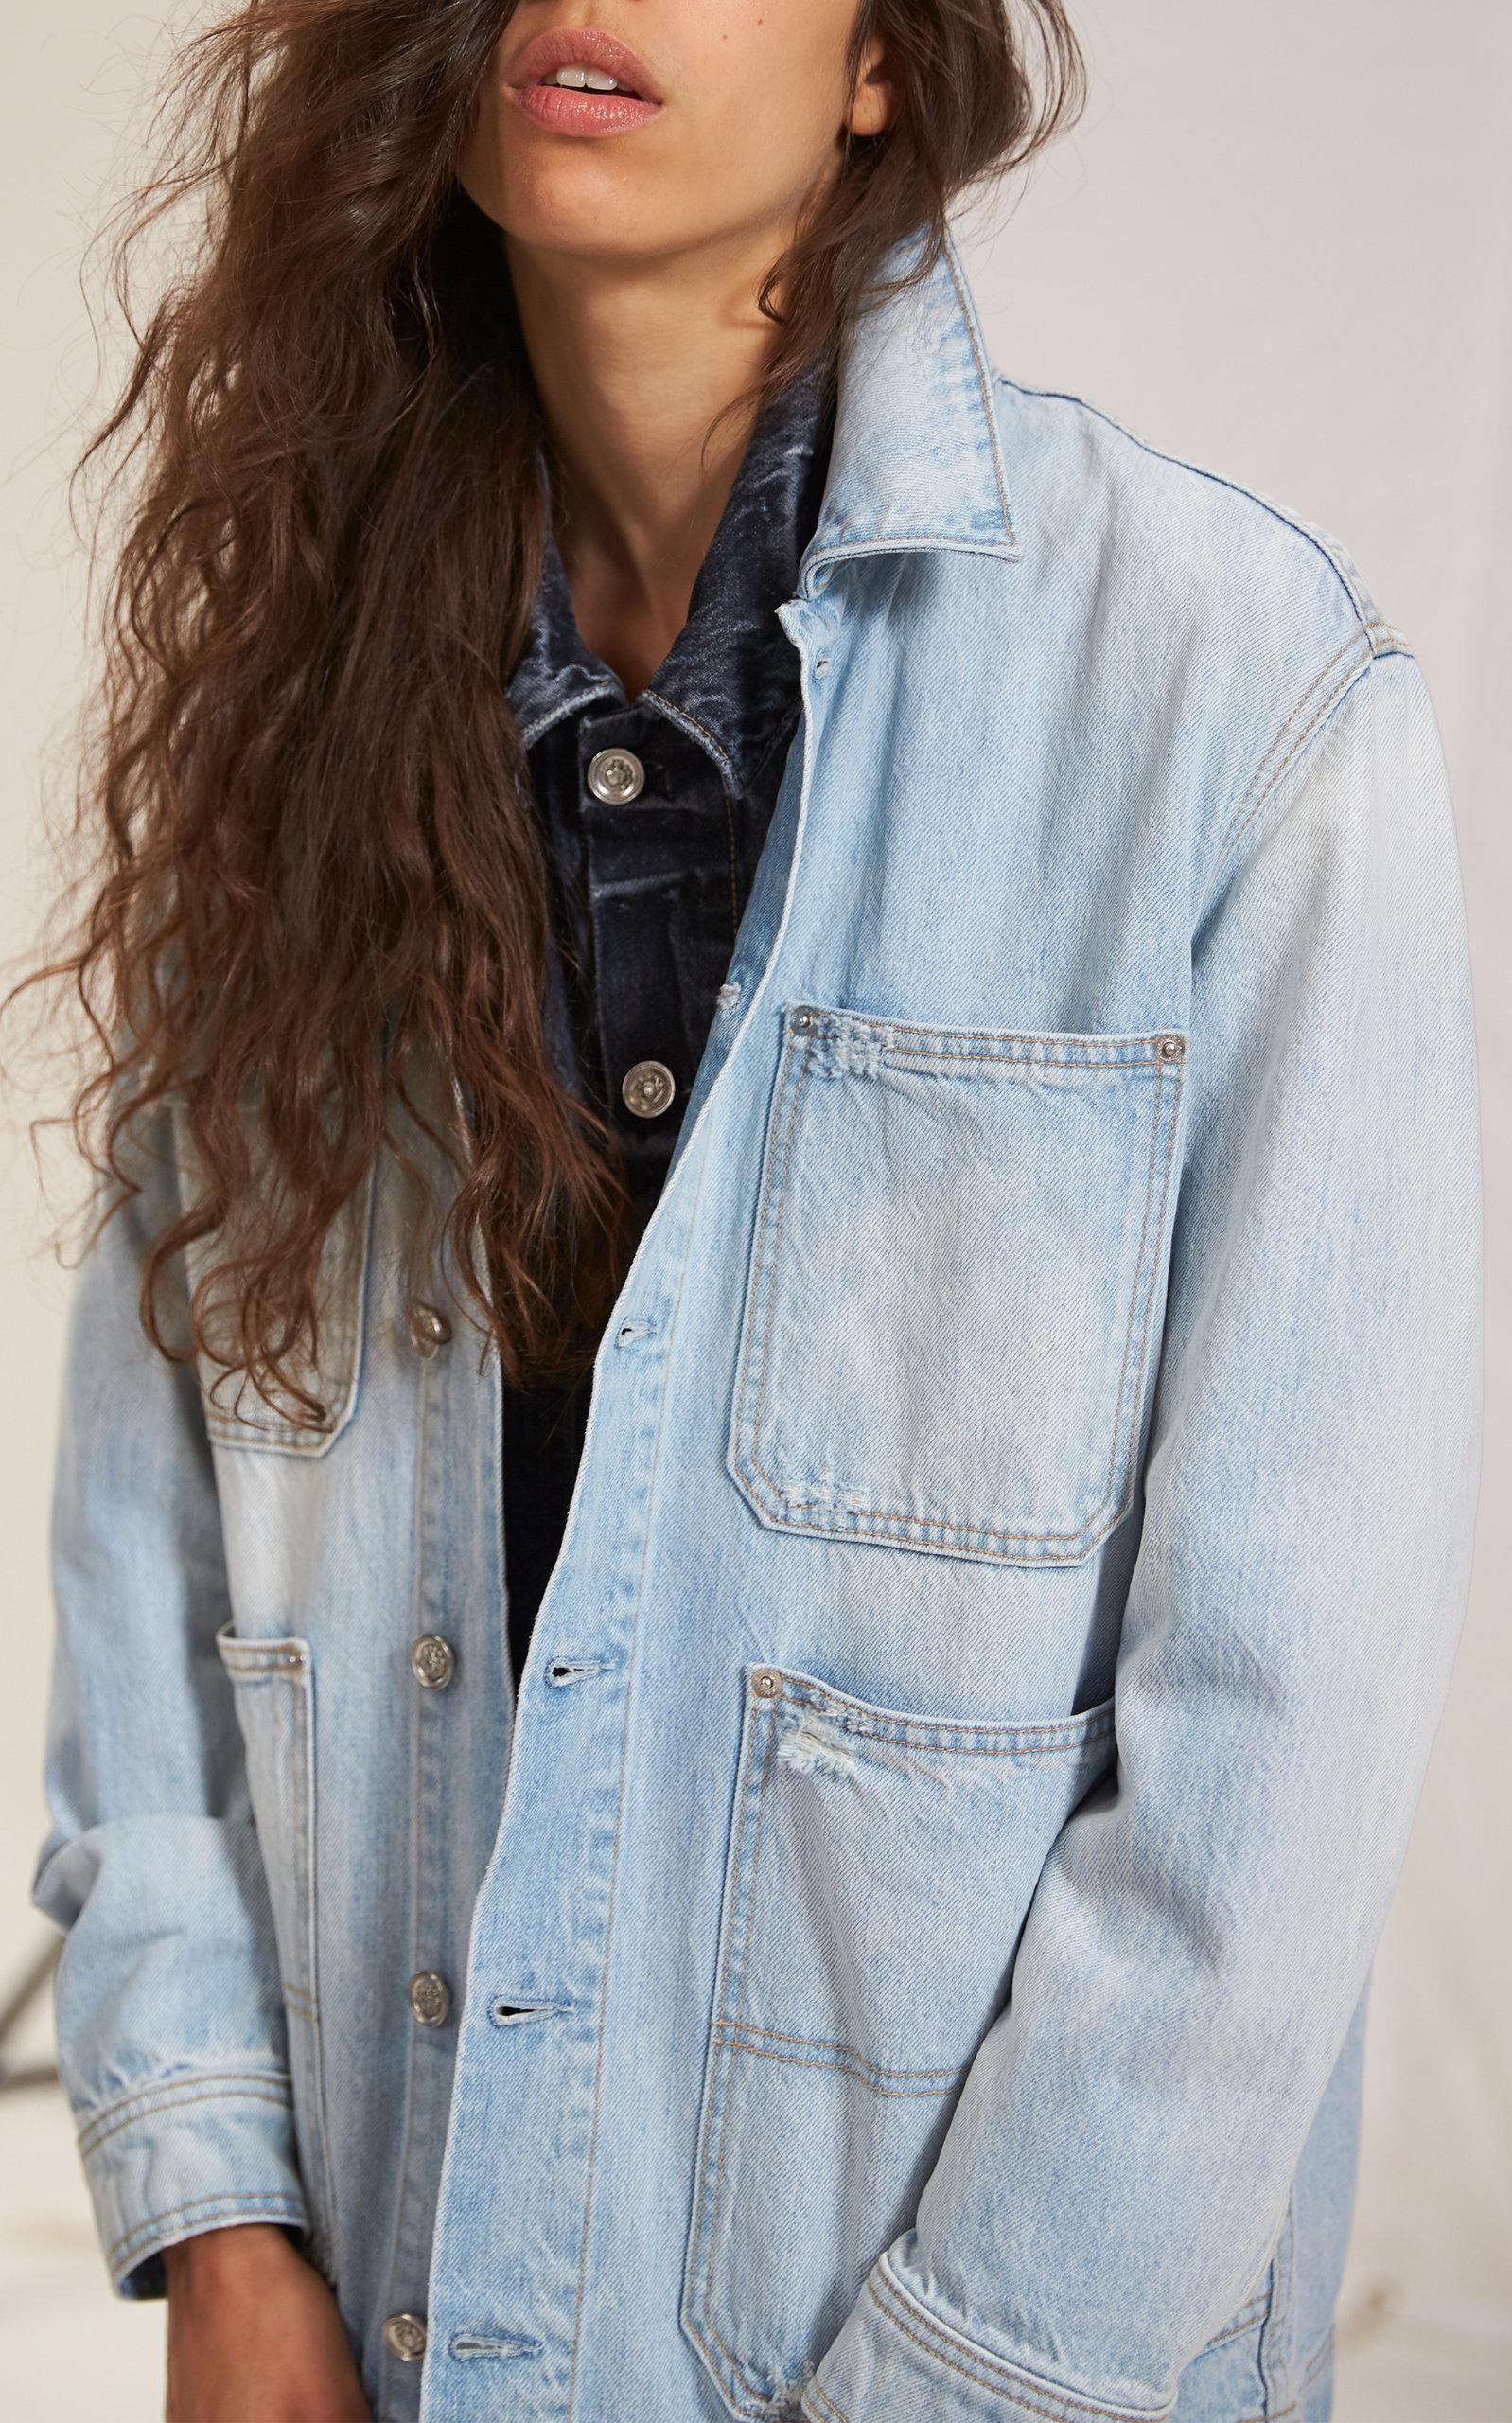 By Operandi Denim Jacket Worker Slvrlake Moda Workwear tZPqcwf0